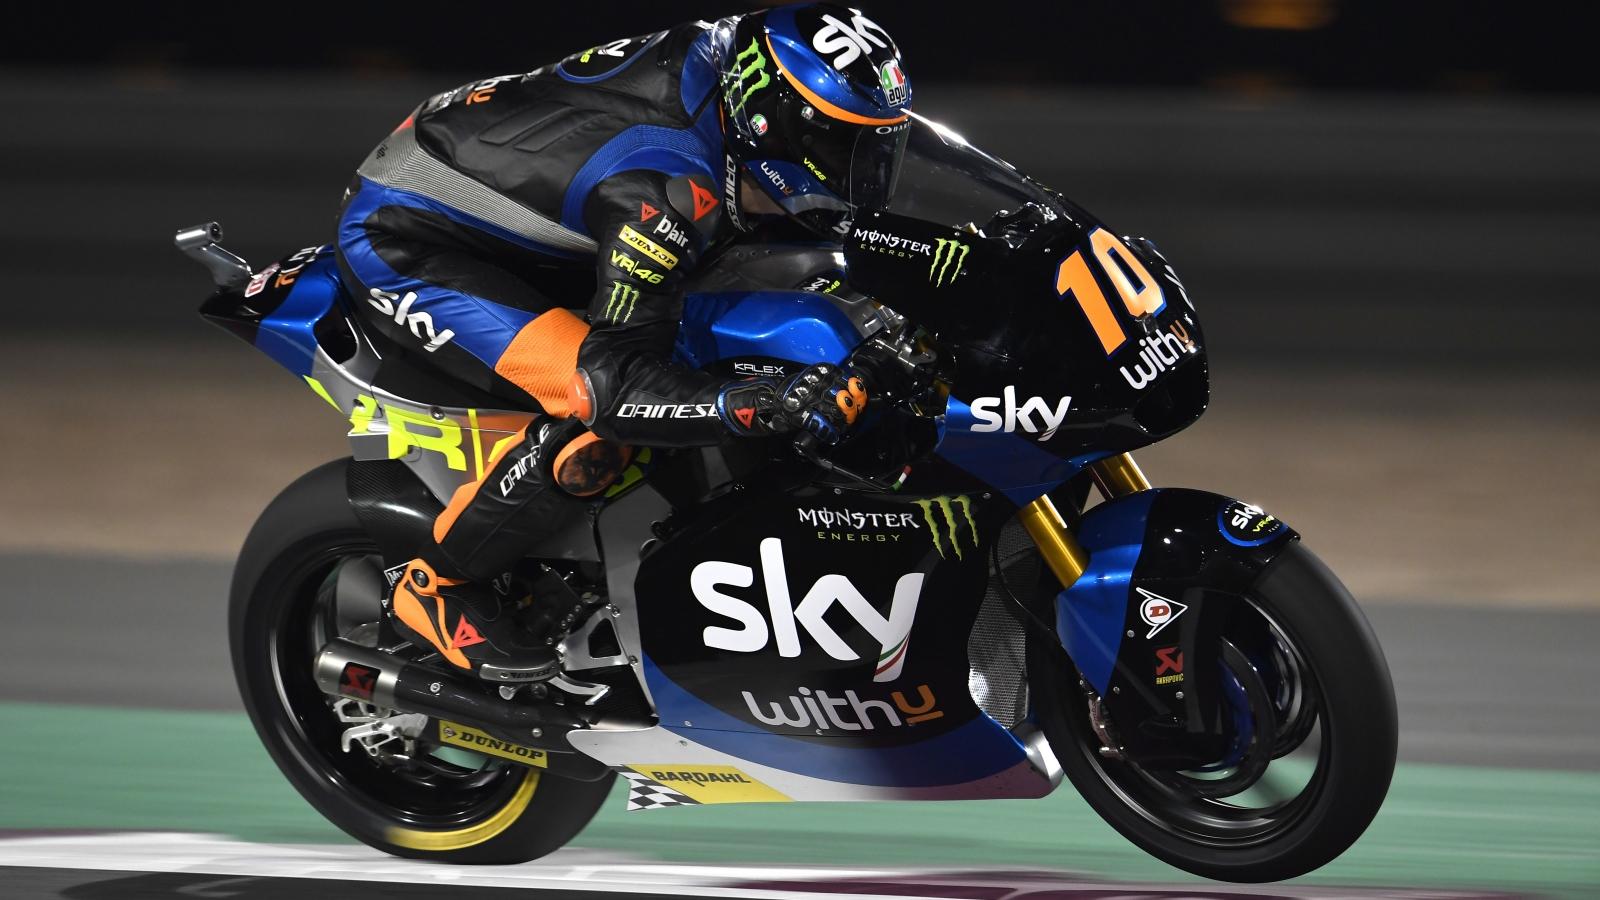 Joe Roberts se lleva la pole de Moto2 en Qatar con Luca Marini en la misma milésima